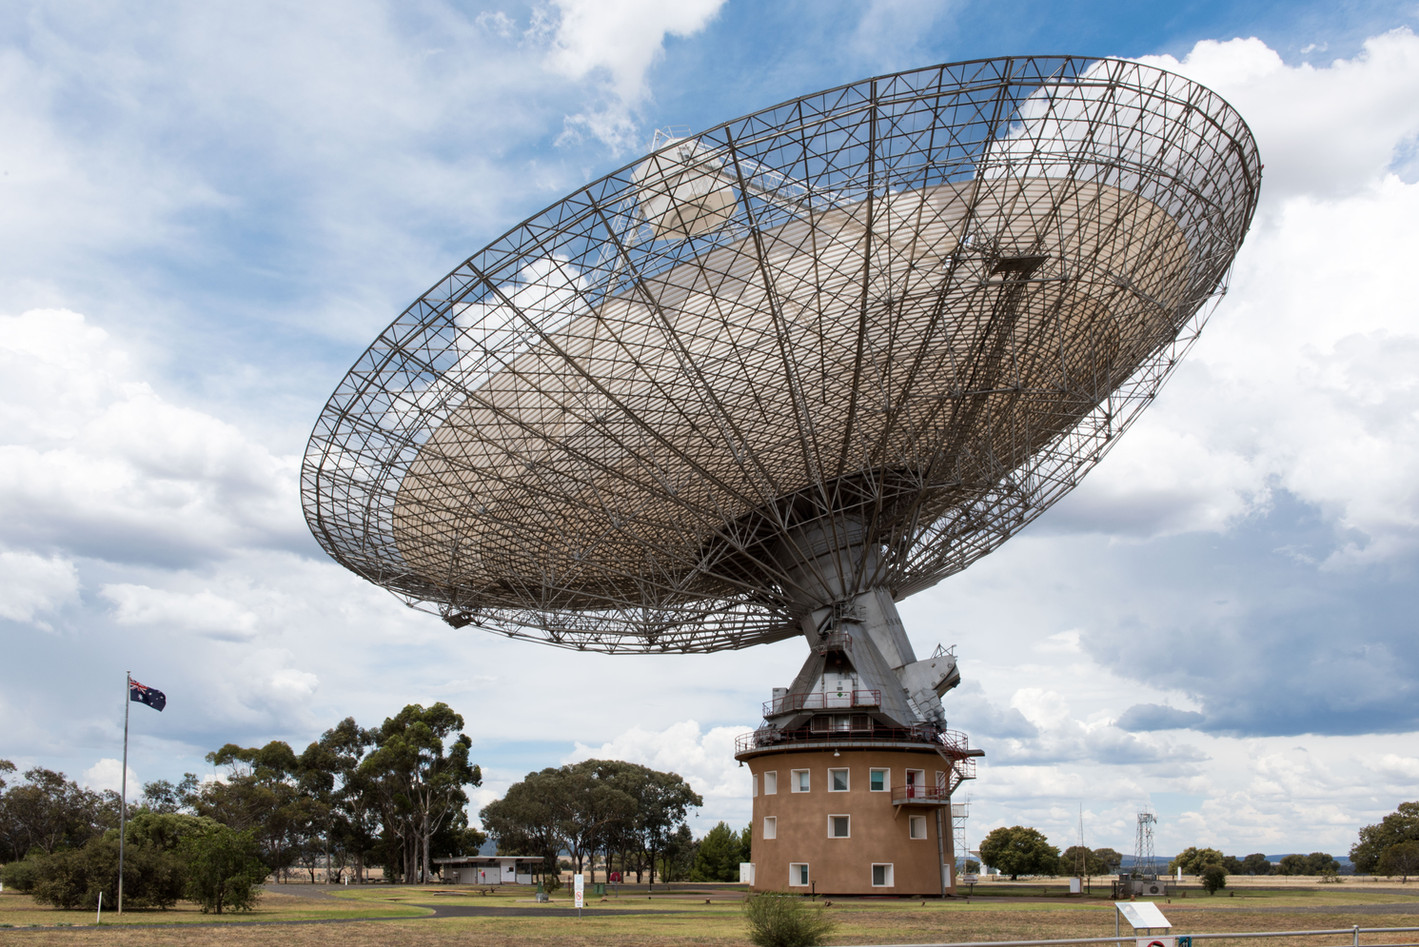 michael_bucknell_Parkes_NSW_telescope_20